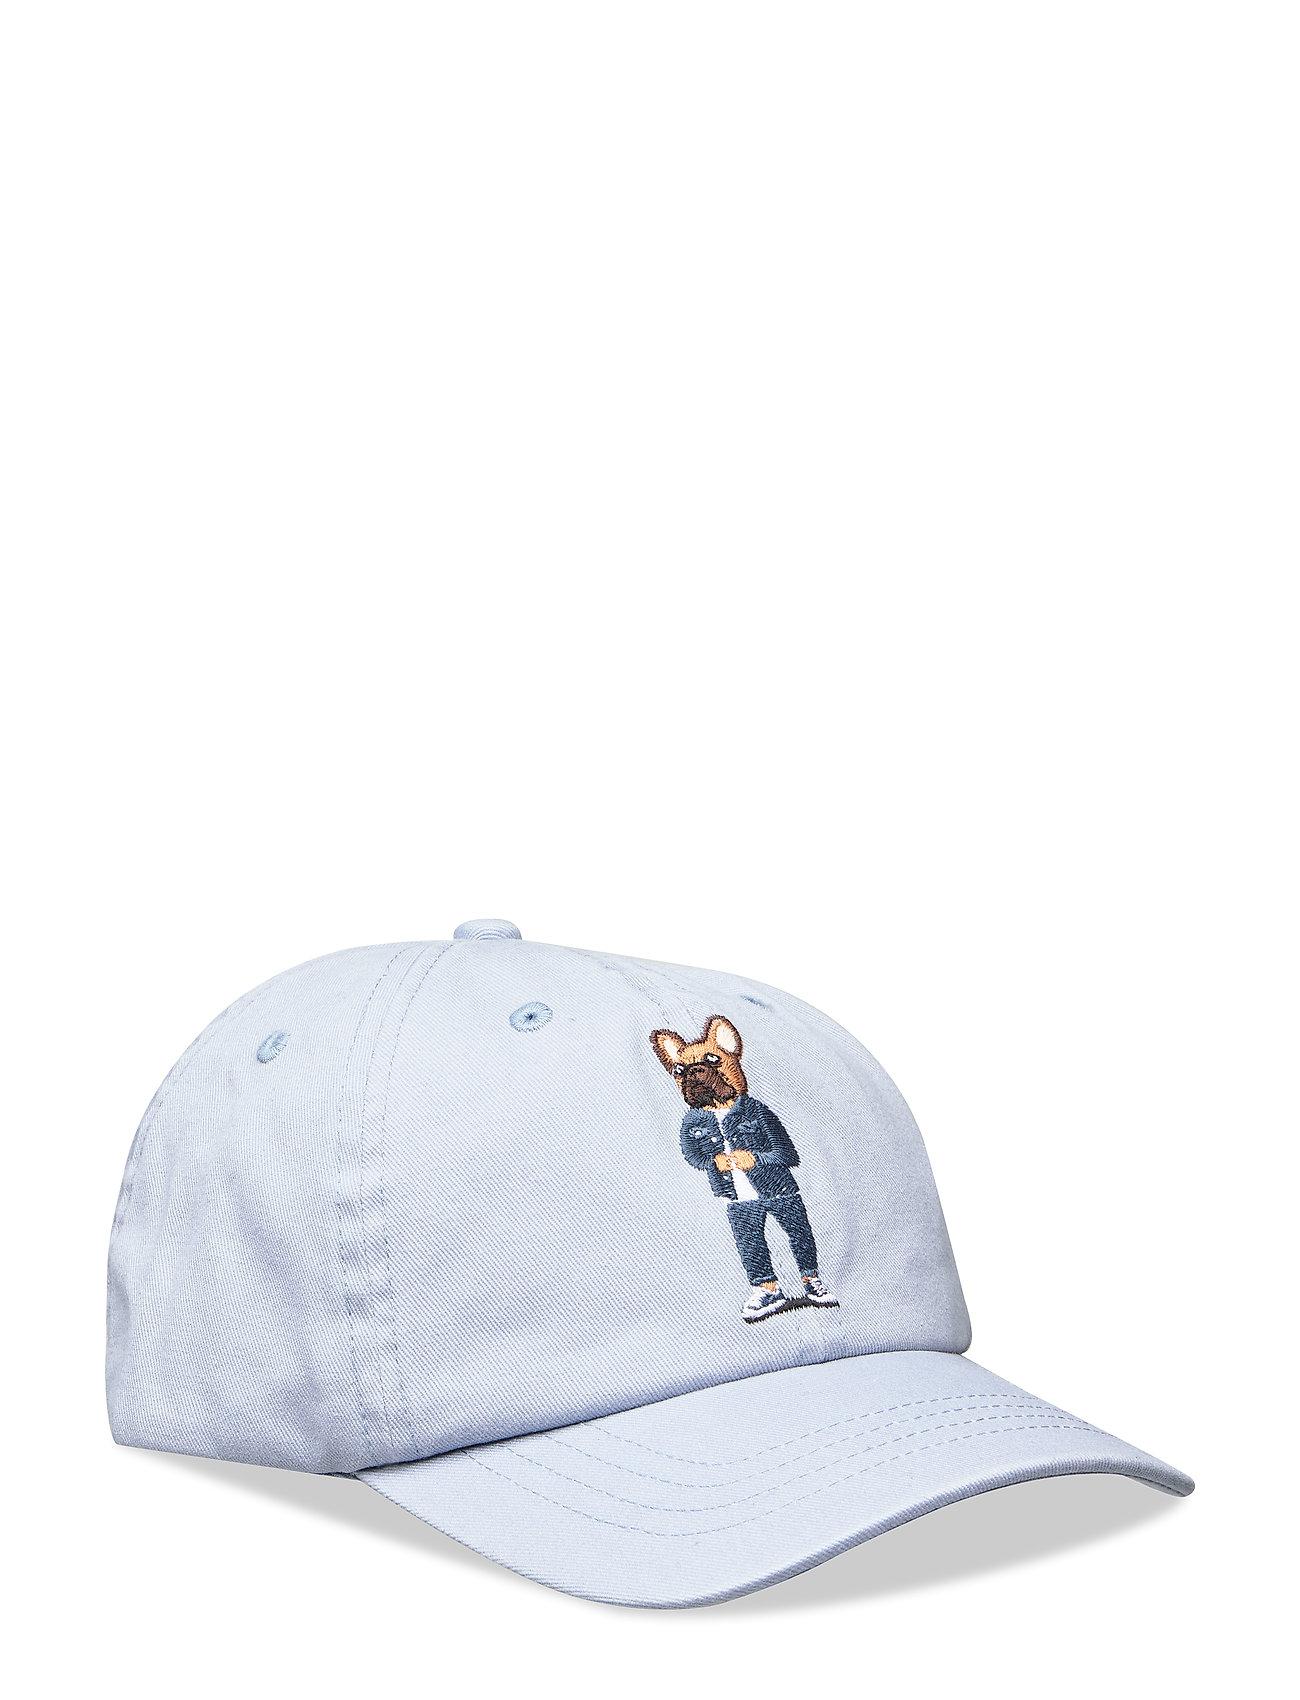 Image of Jacfrenchie Baseball Cap Jr Accessories Headwear Caps Blå Jack & J S (3329983195)